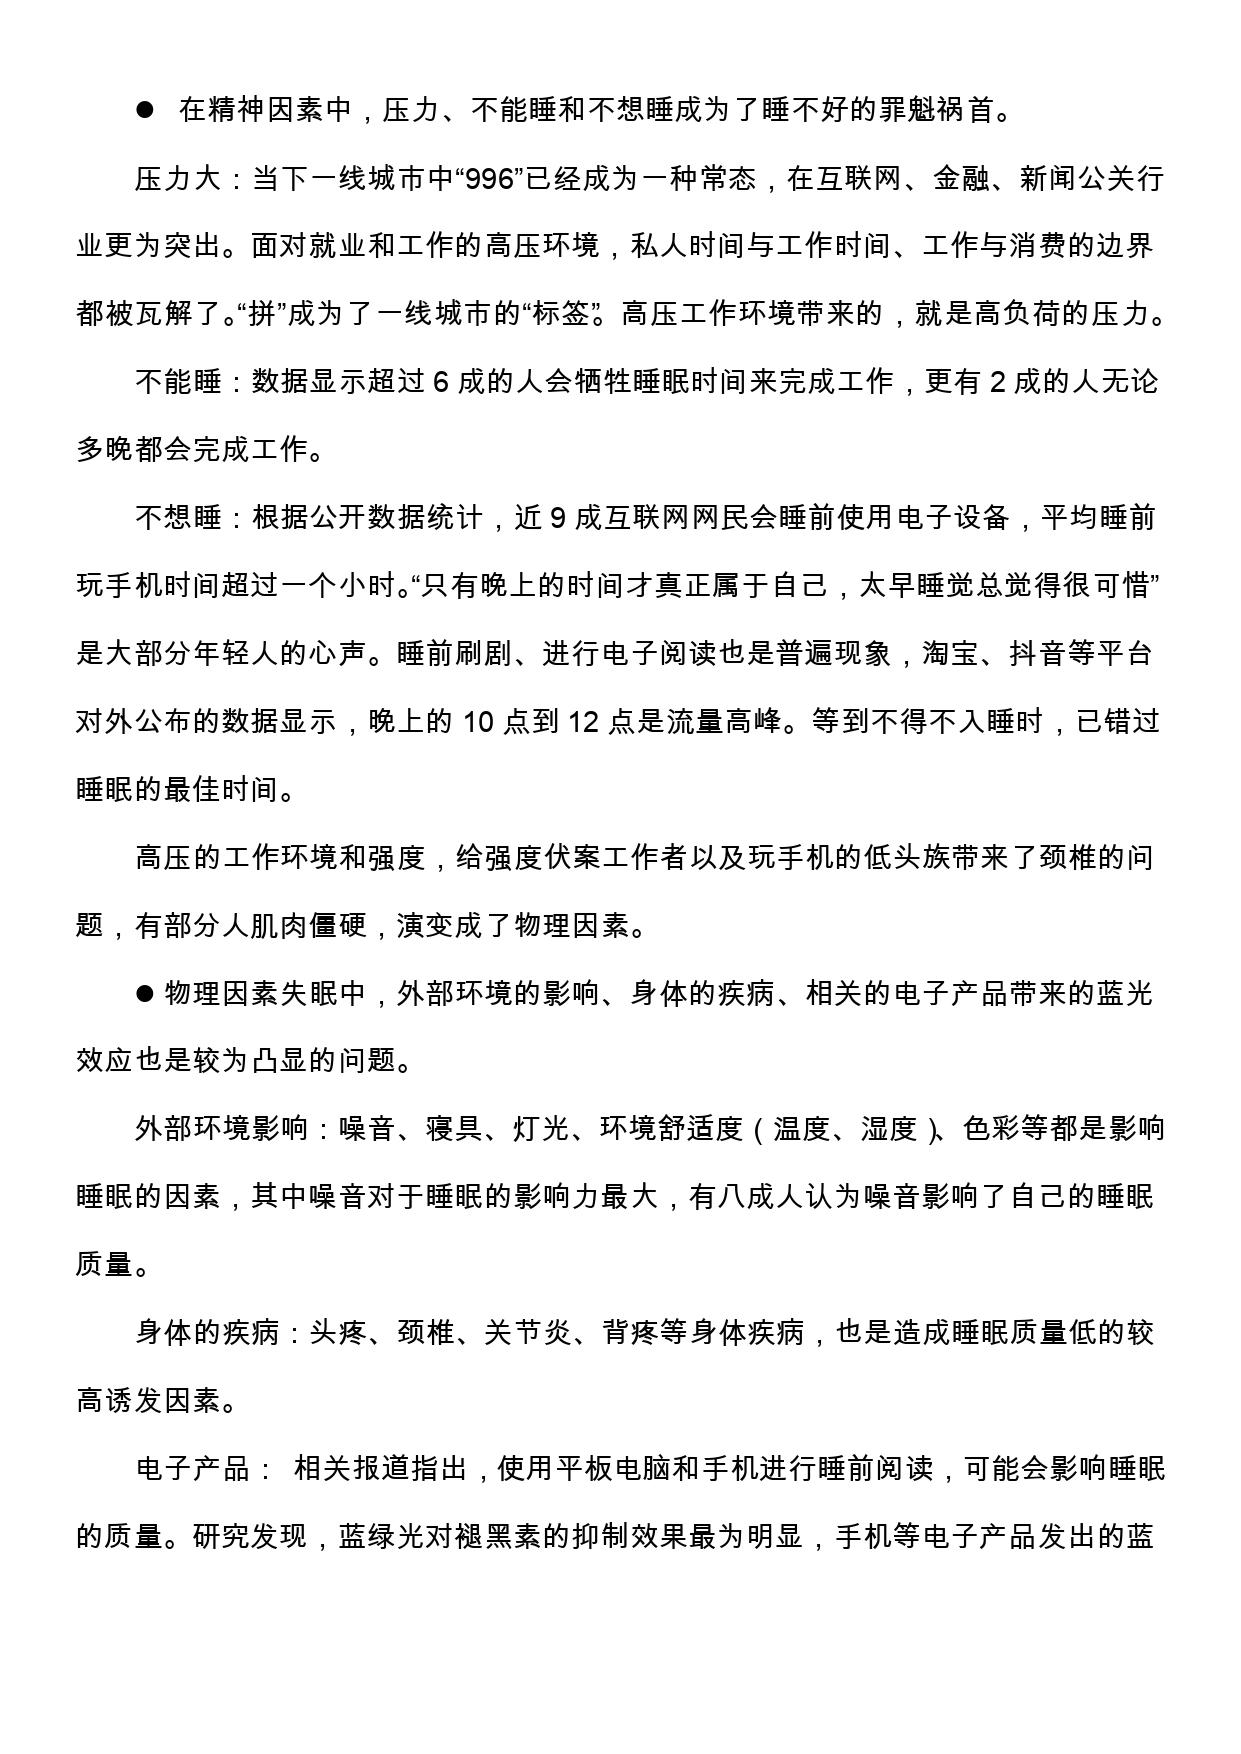 2019中国睡眠科技白皮书-10.31(1)_pages-to-jpg-0011 (1).png